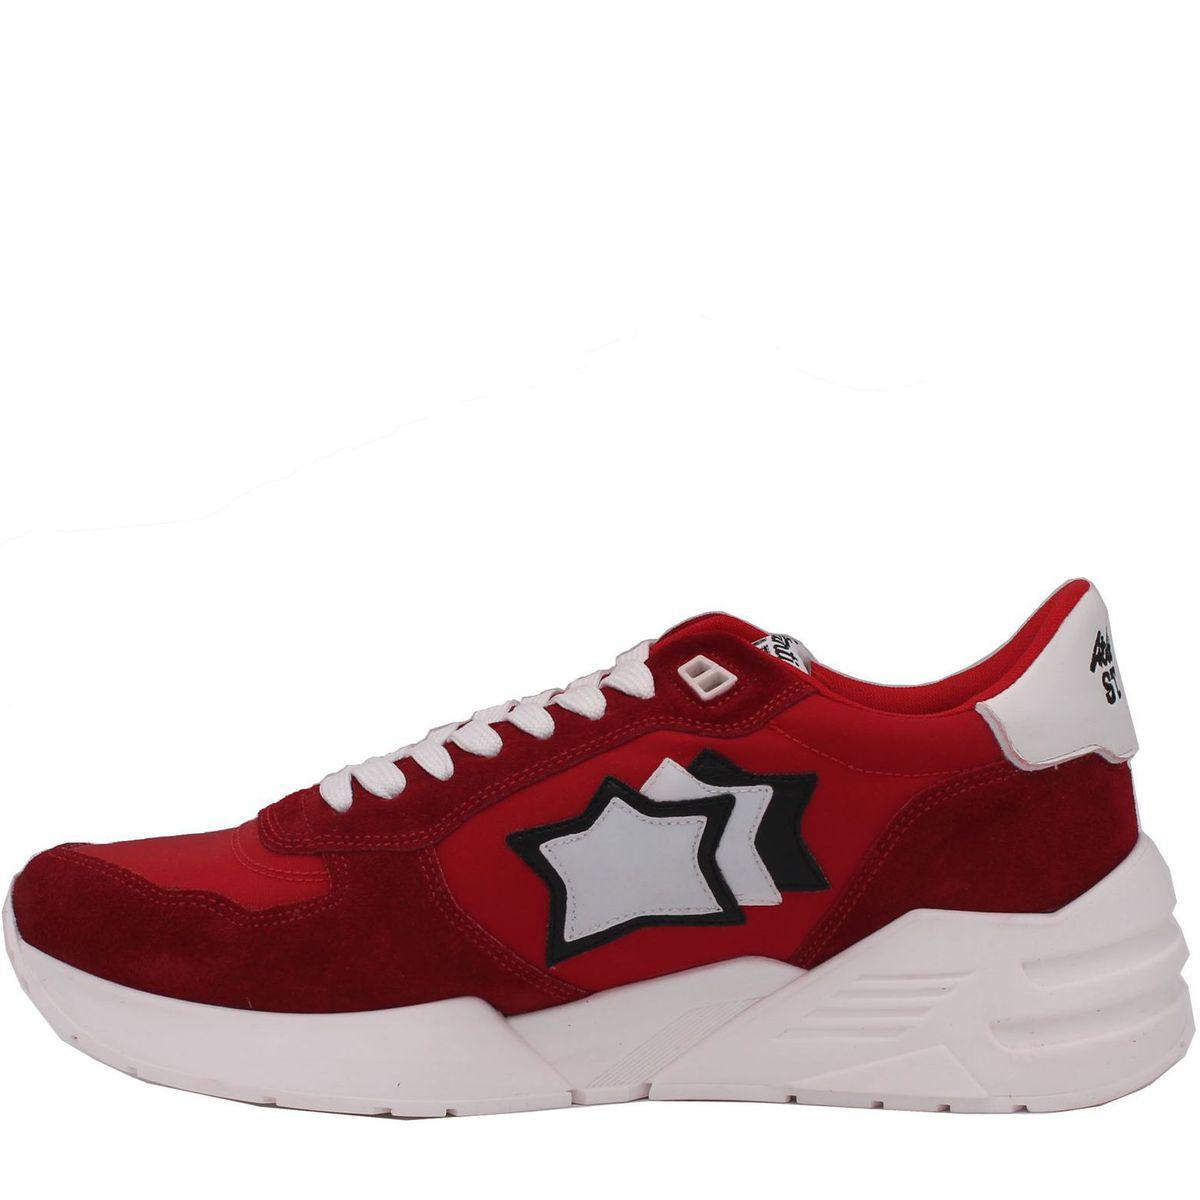 1. Sneakers modello mars rosso Atlantic Stars Rosso Atlantic Stars